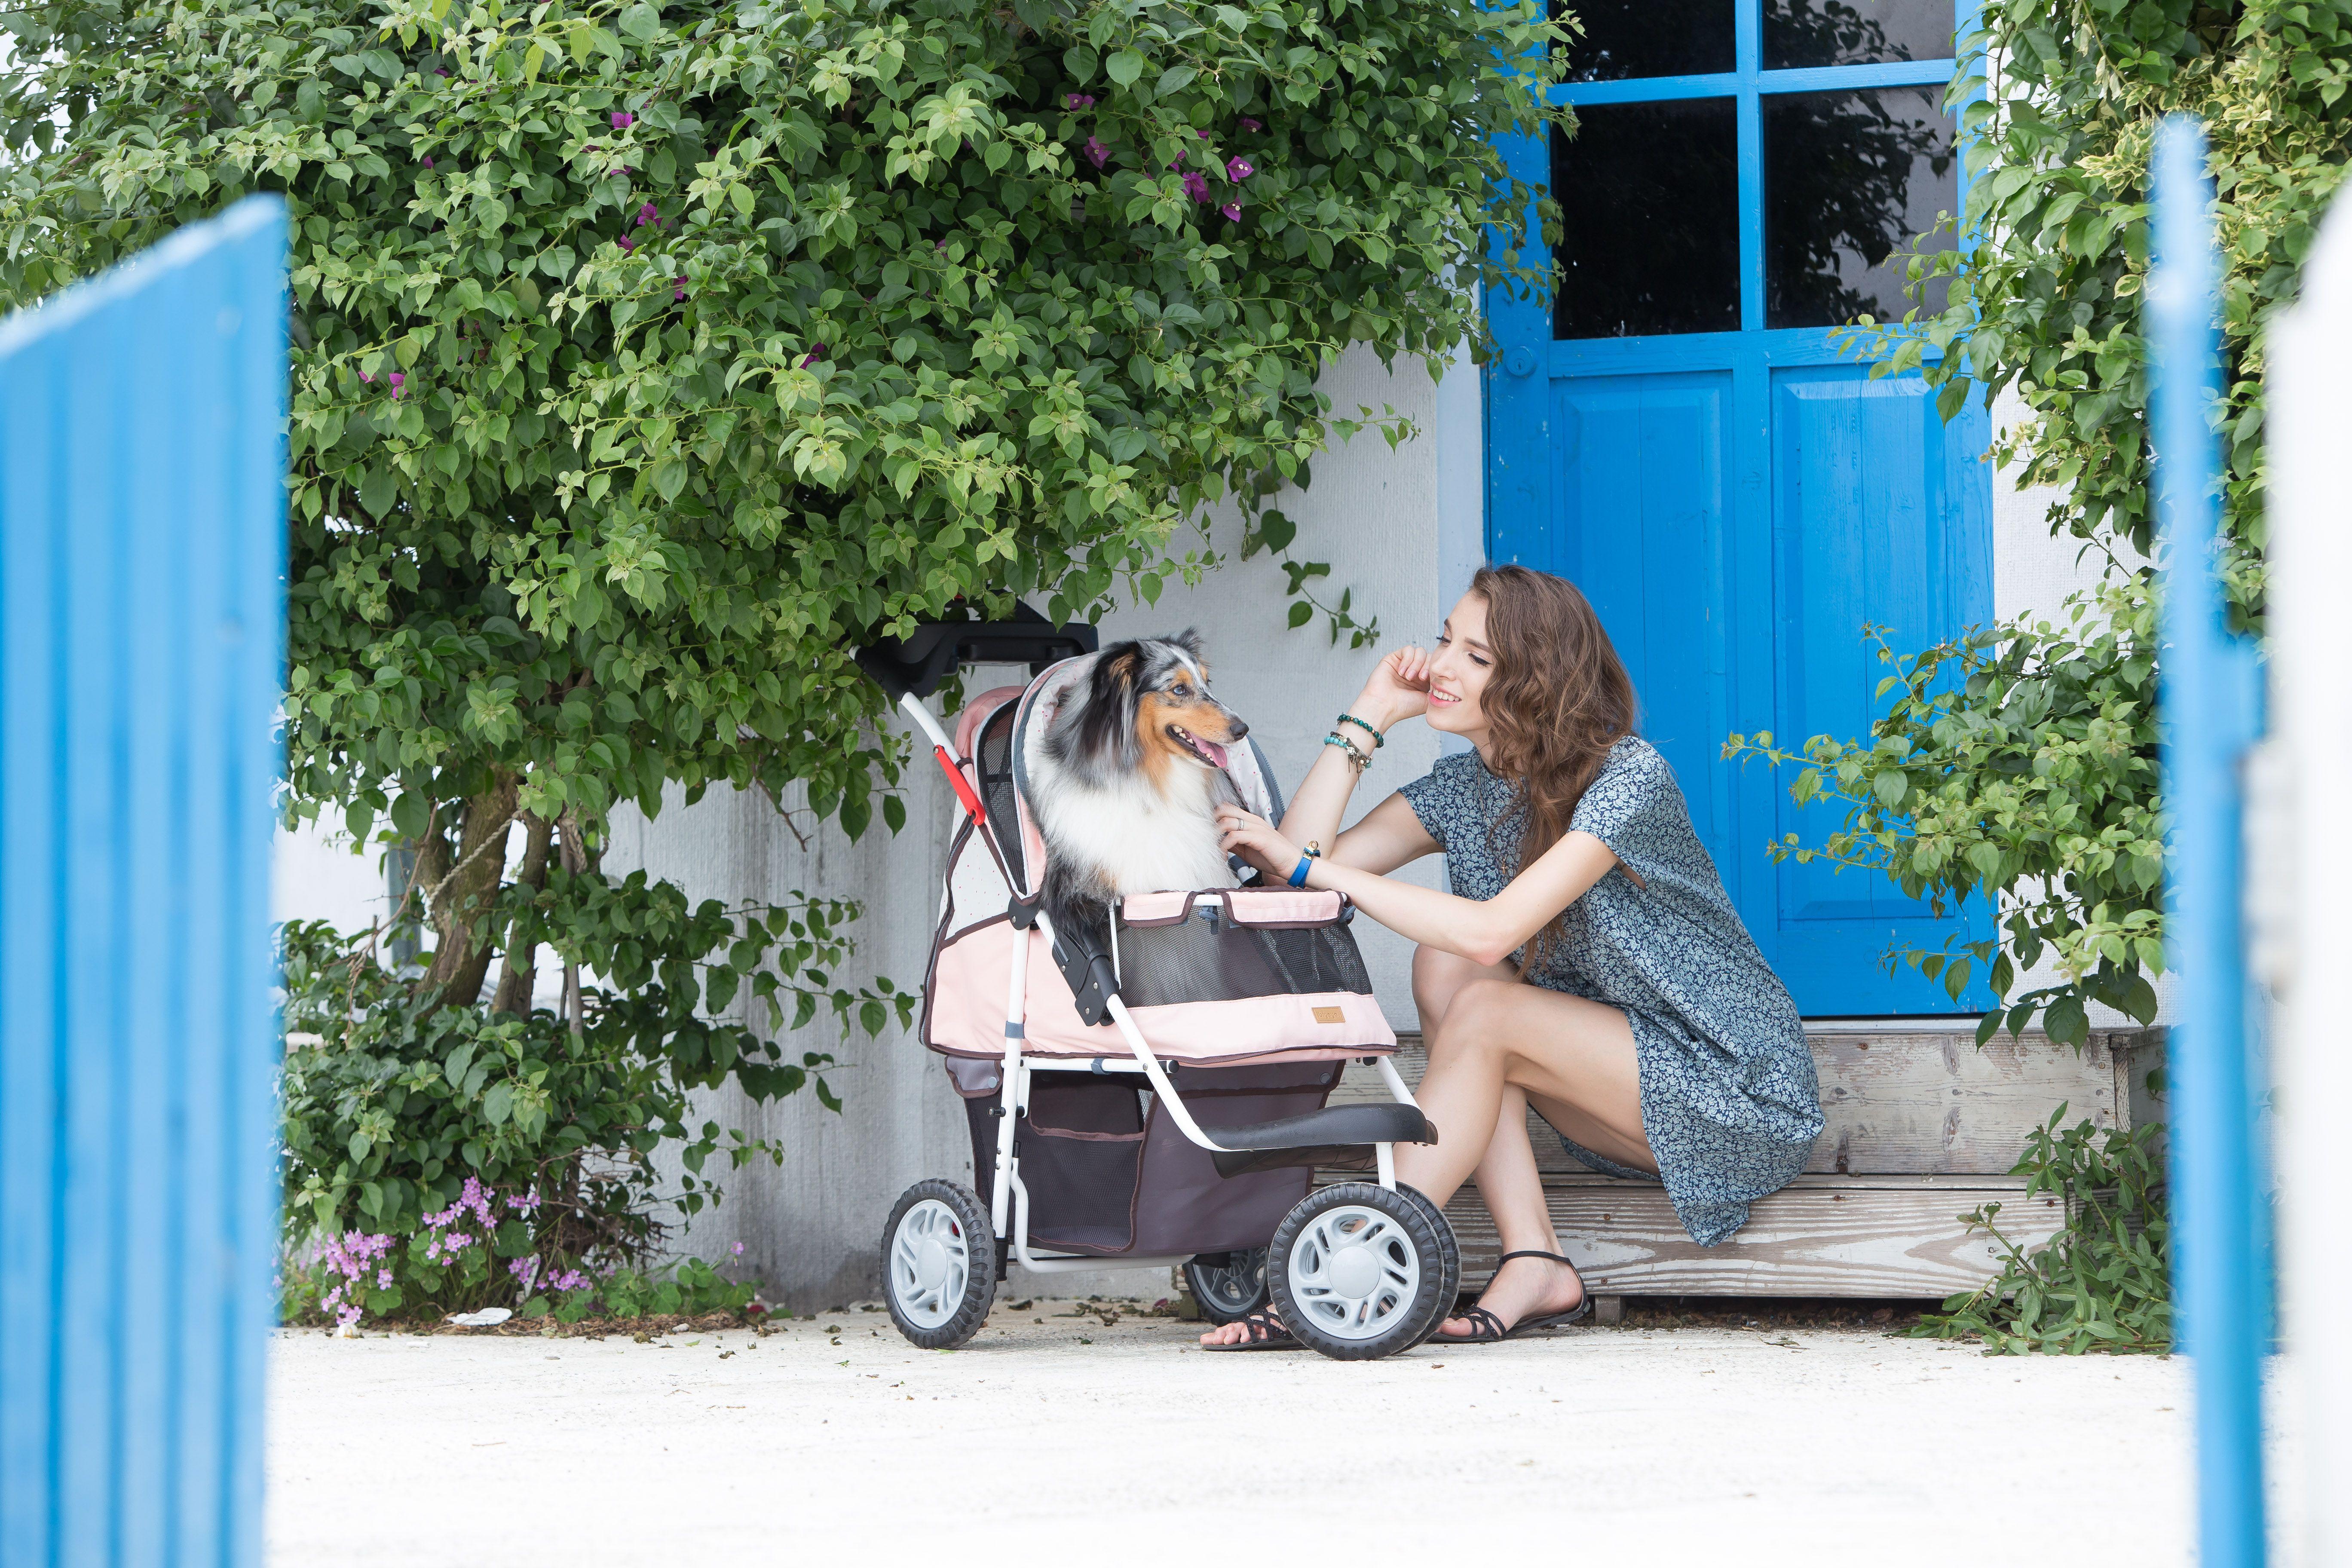 Collie fun time. A day on the beach. Ibiyaya pet stroller